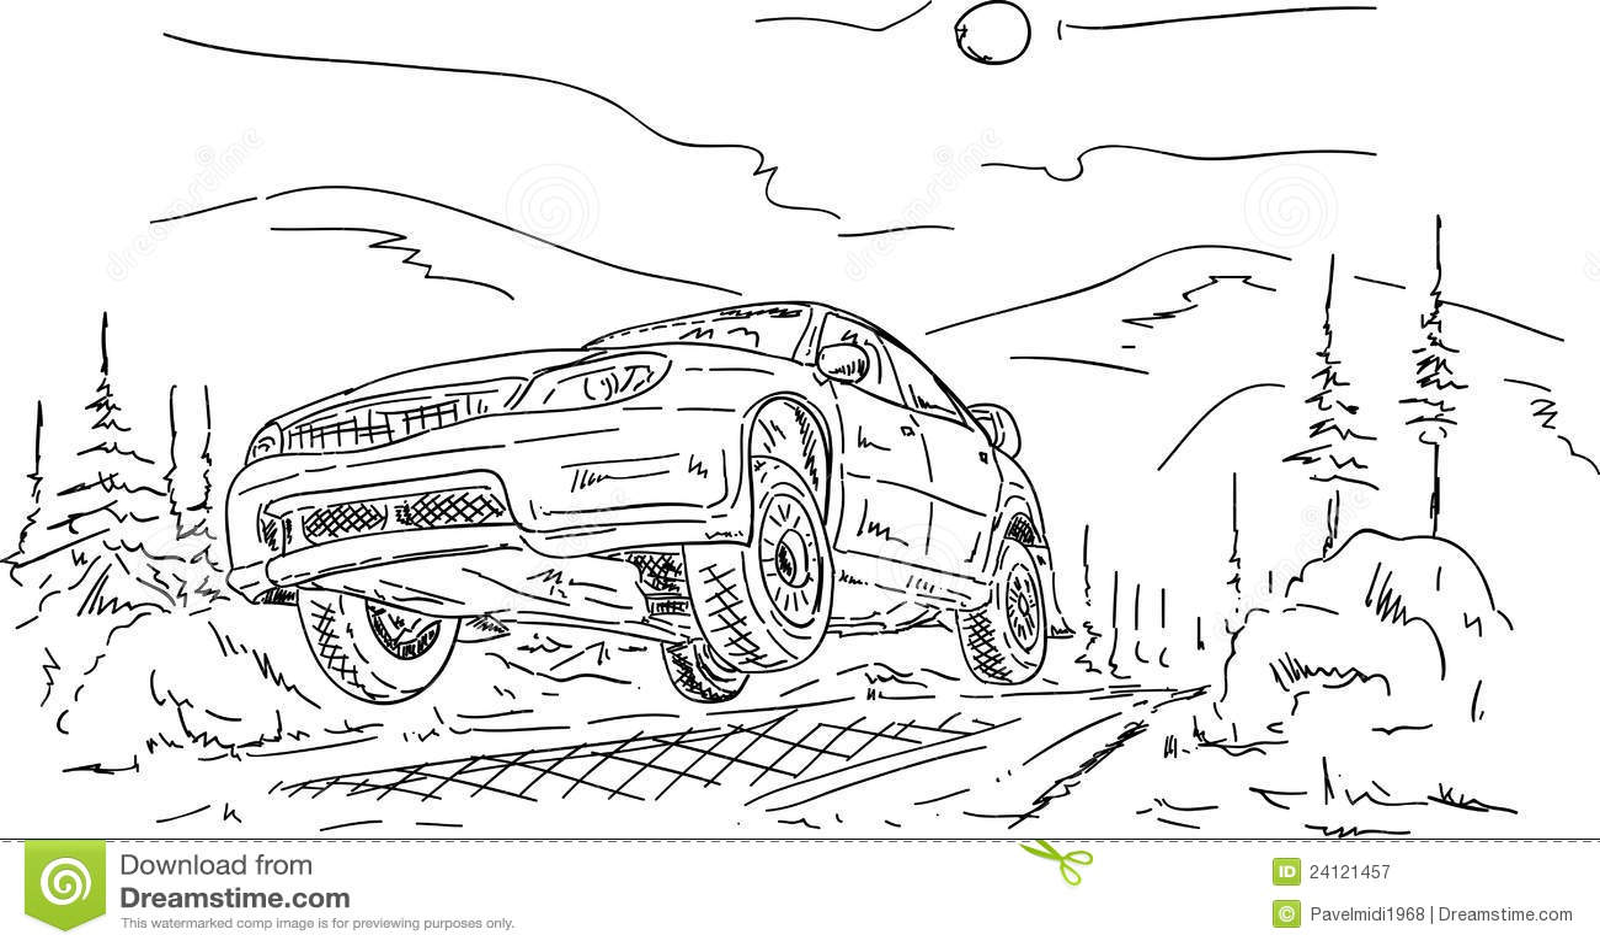 Rally car jumping stock vector. Illustration of